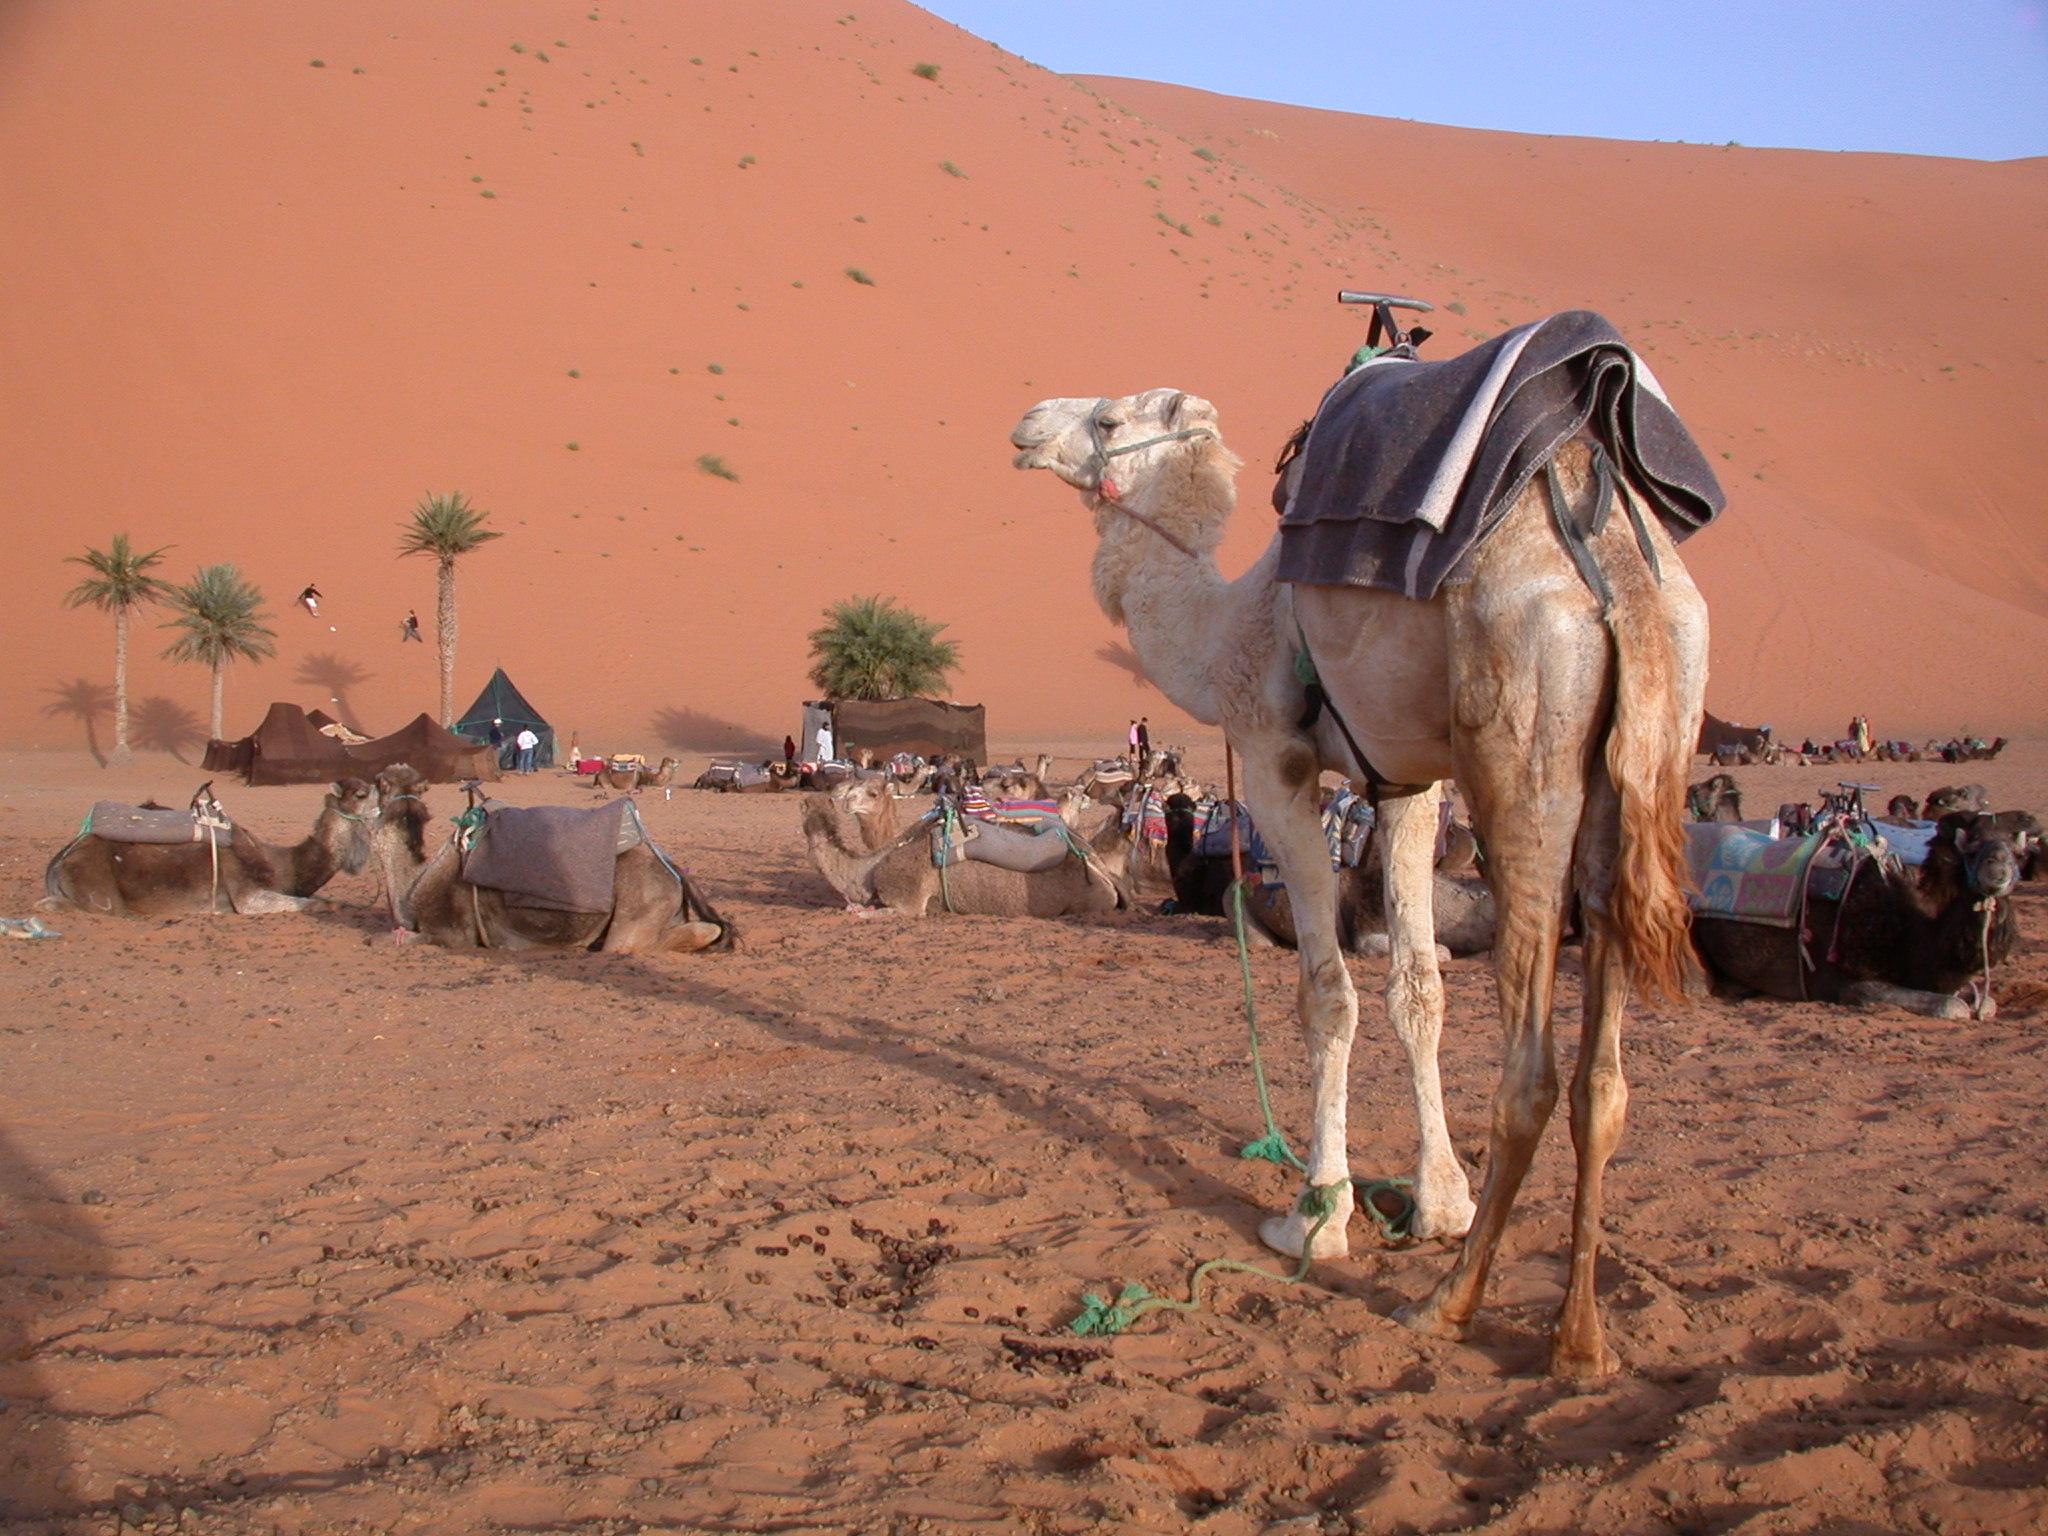 Luca Errera, Daniela Trastulli, Marocco, deserto, dromedario